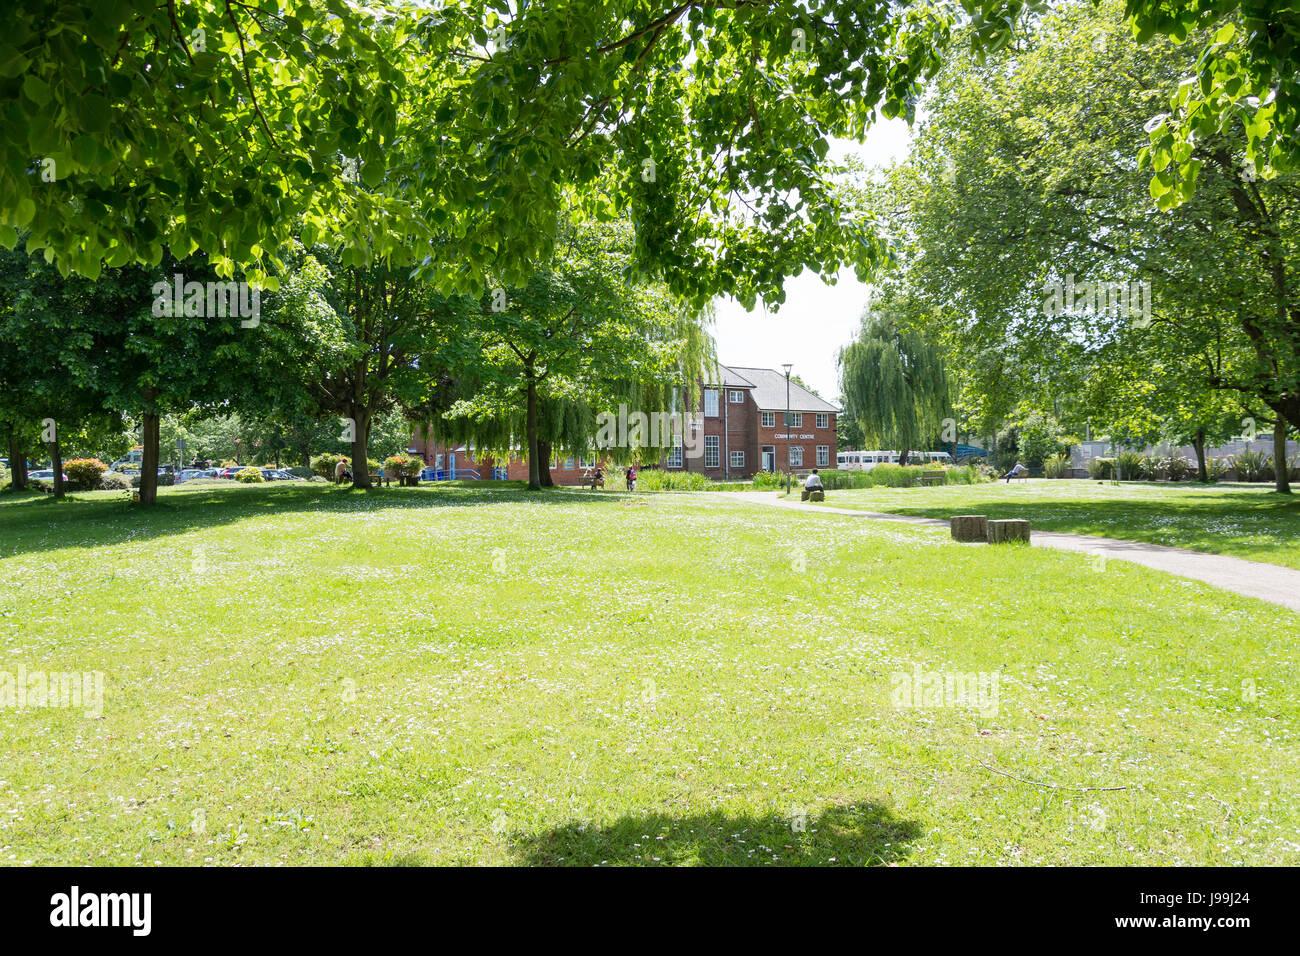 Civic Gardens, Farnborough, Hampshire, England, United Kingdom - Stock Image